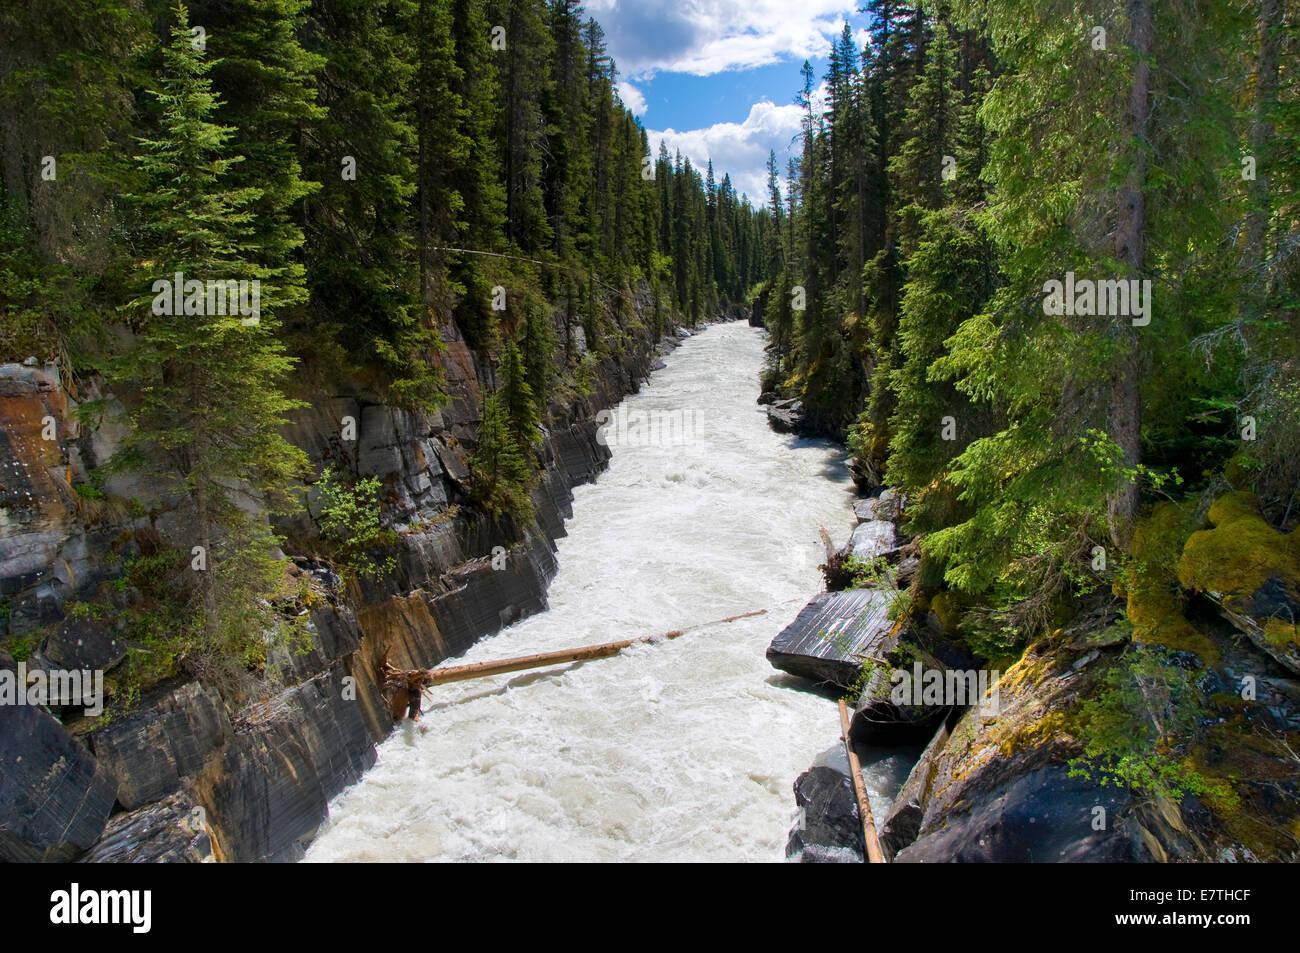 Numa Falls, Kootenay National Park, British Columbia, Canada - Stock Image